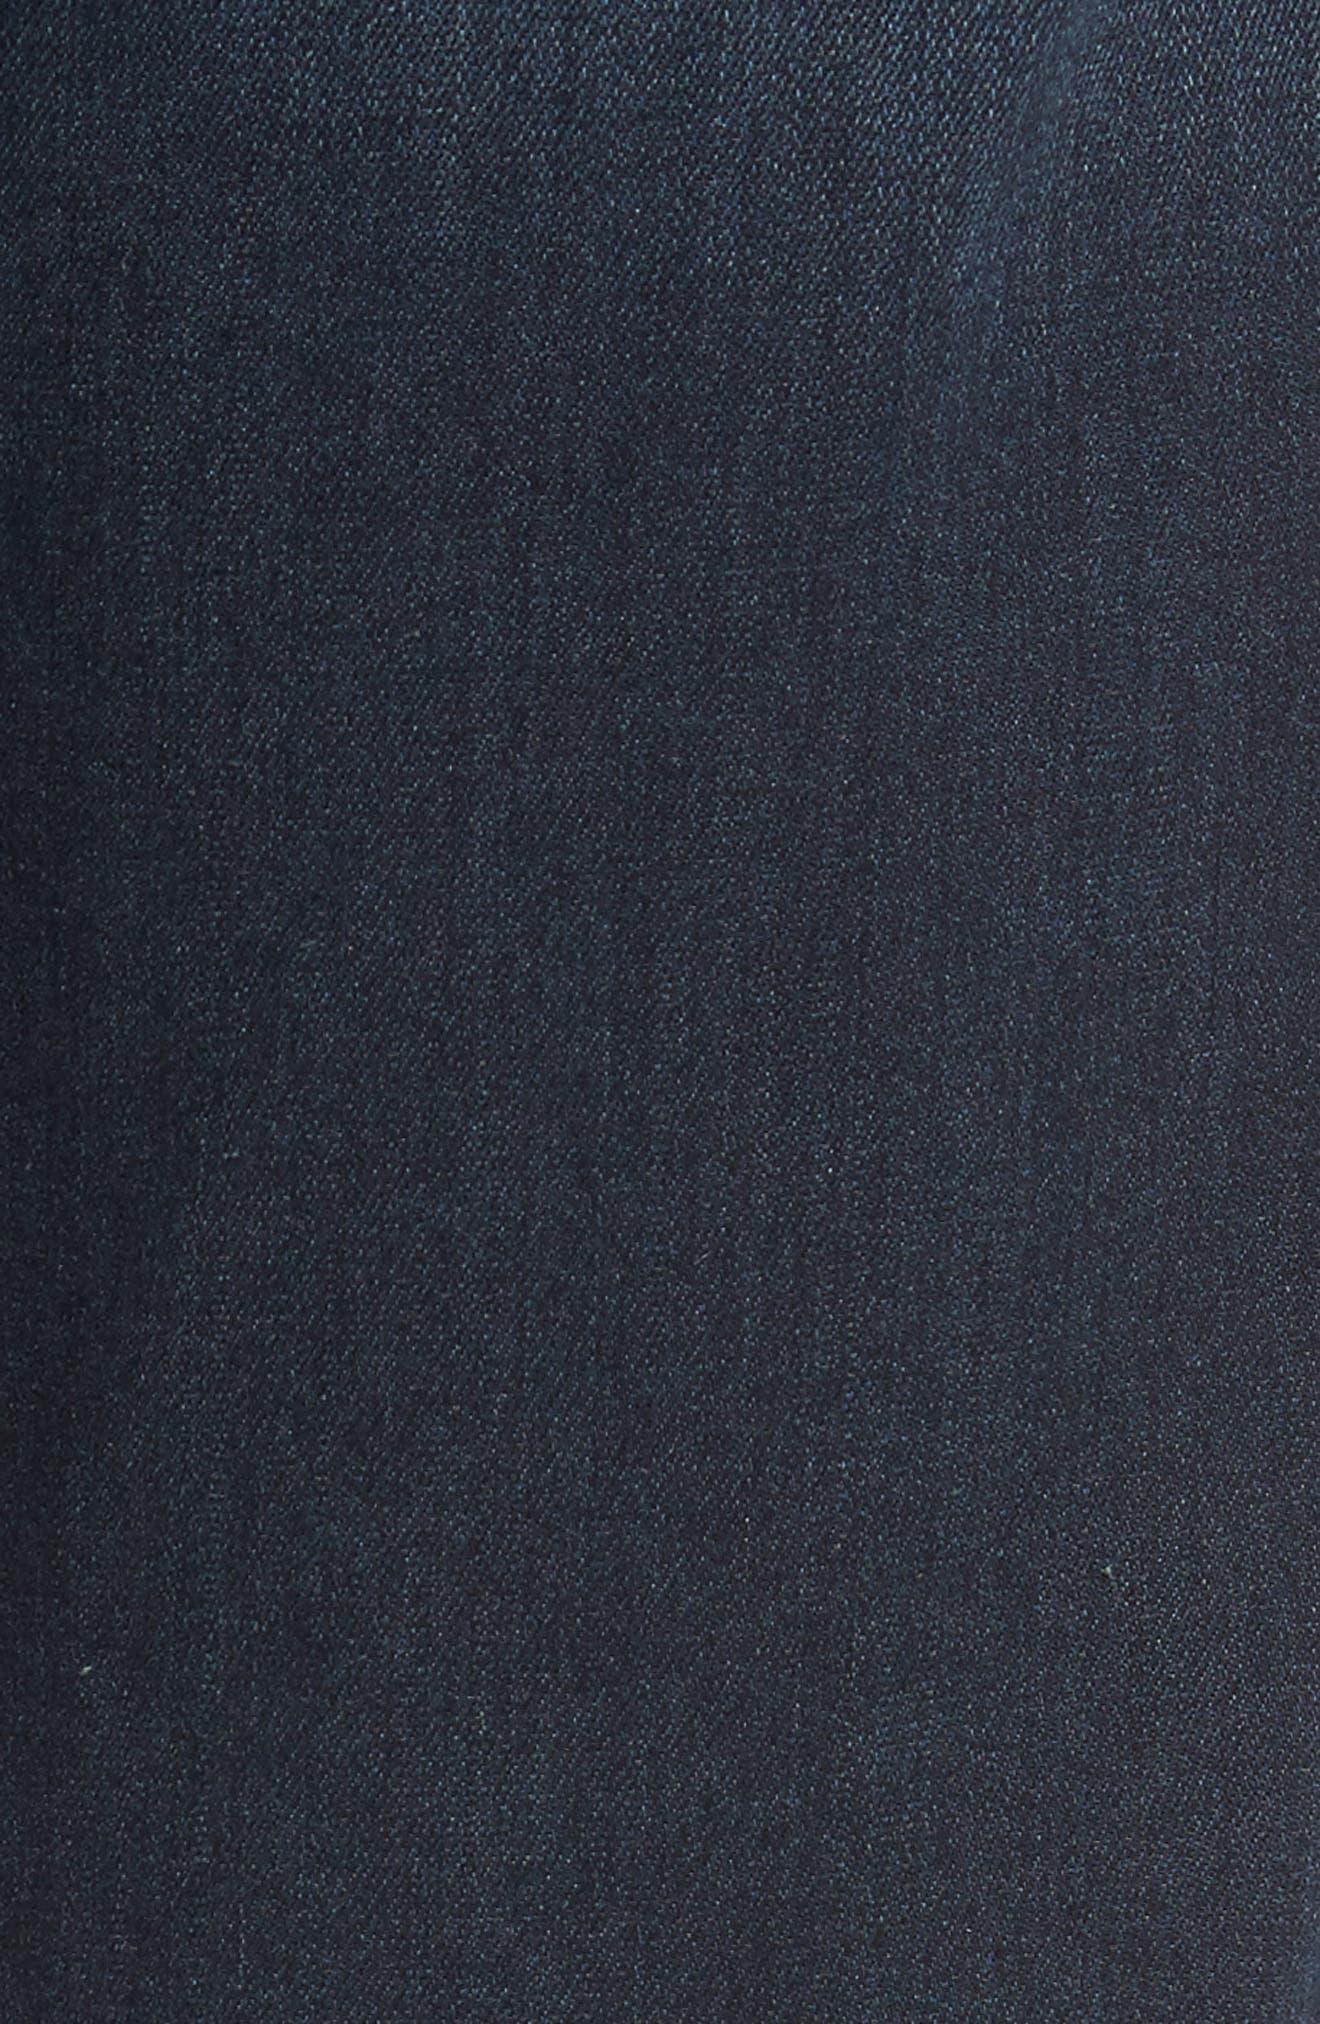 Normandie Straight Fit Jeans,                             Alternate thumbnail 5, color,                             400